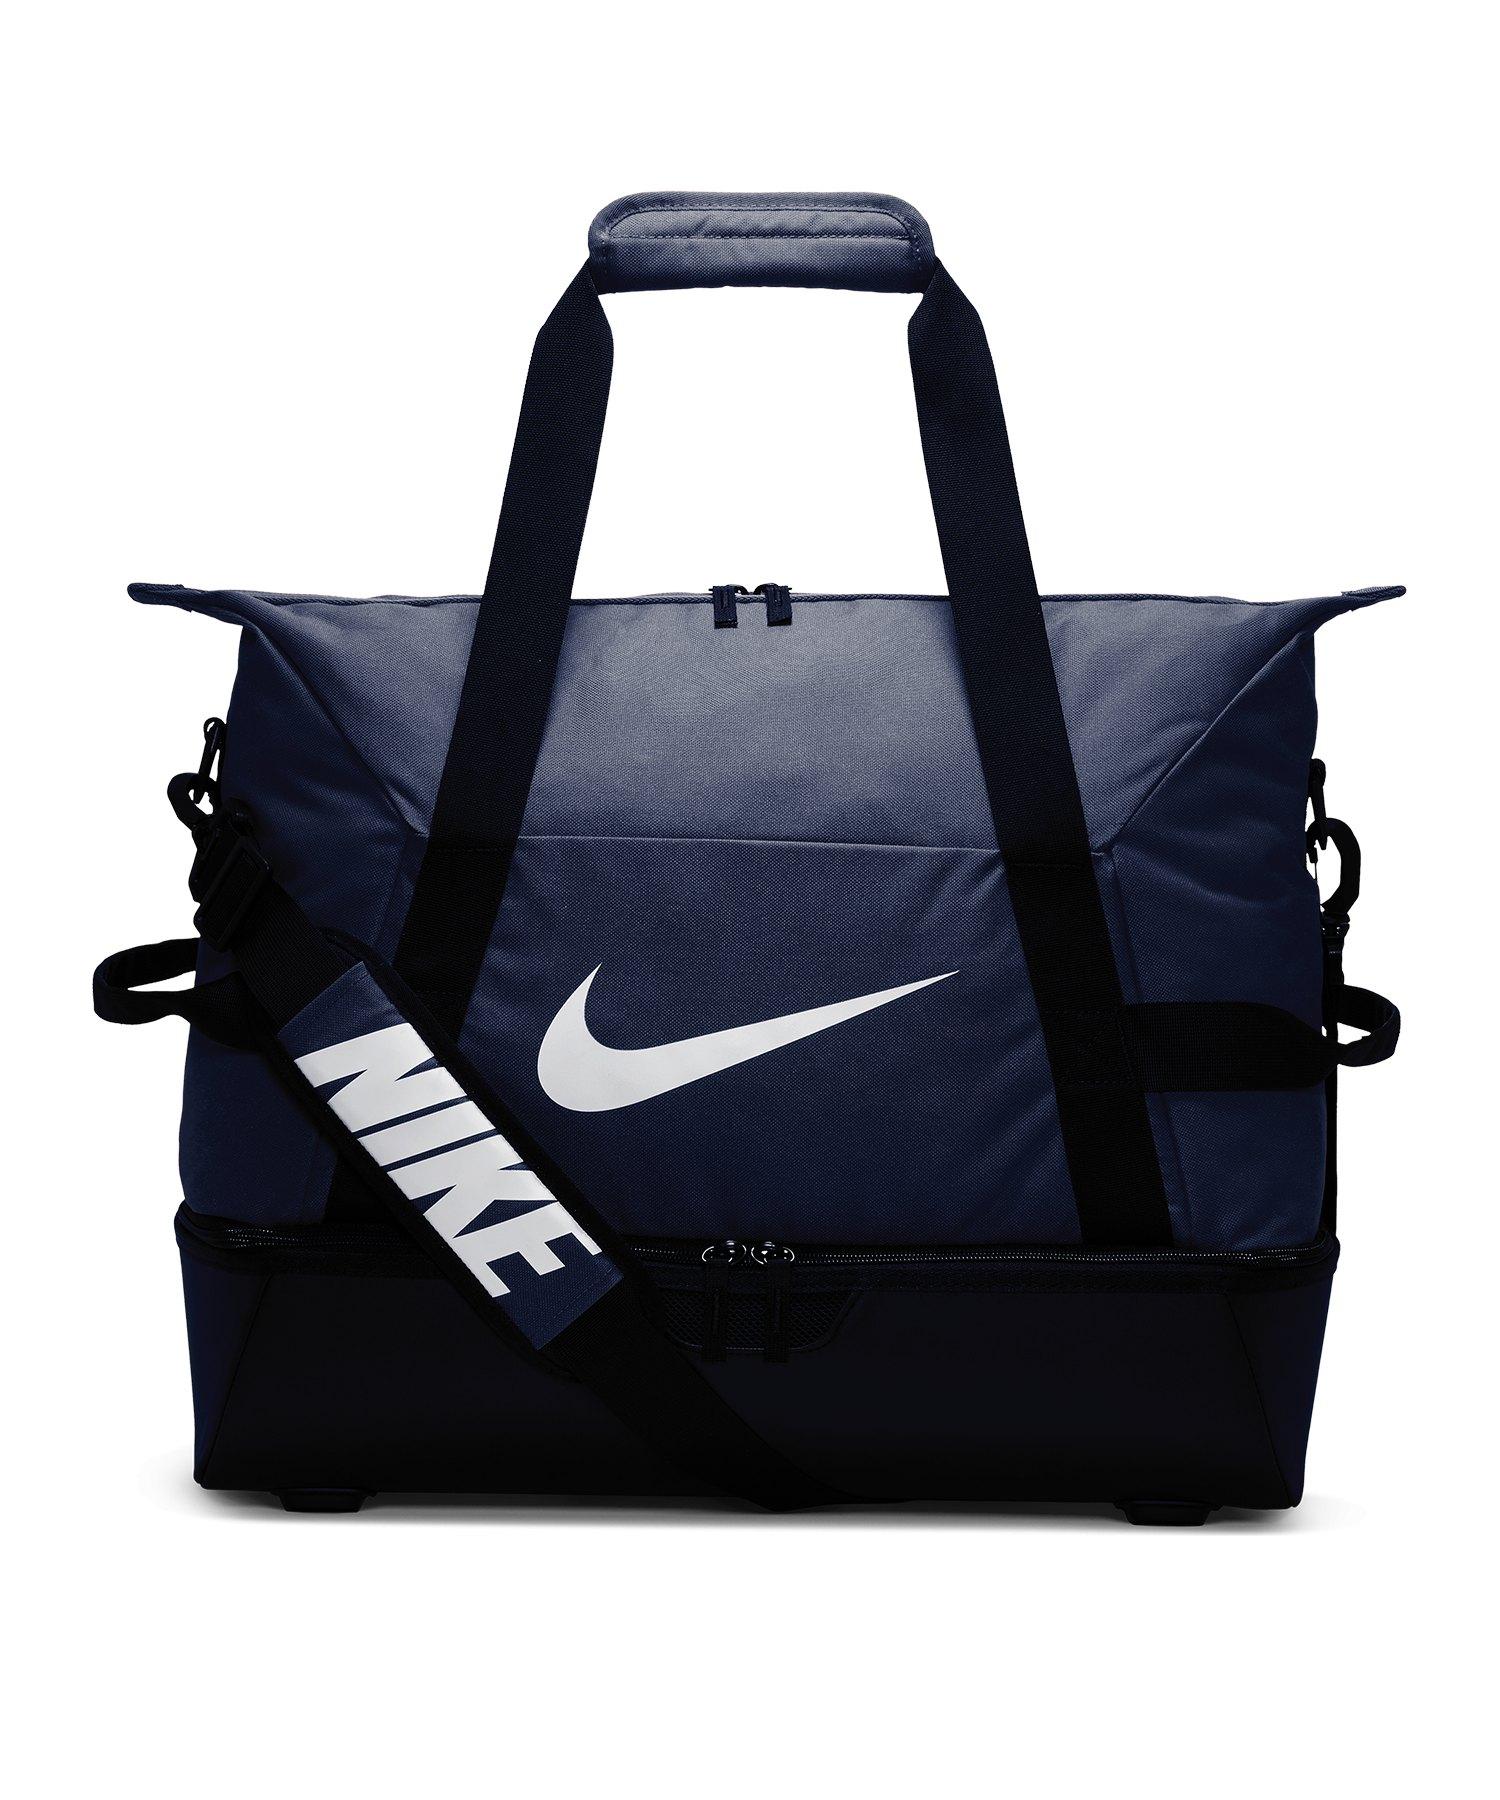 Nike Academy Duffle Tasche Large m.B. Blau F410 - blau